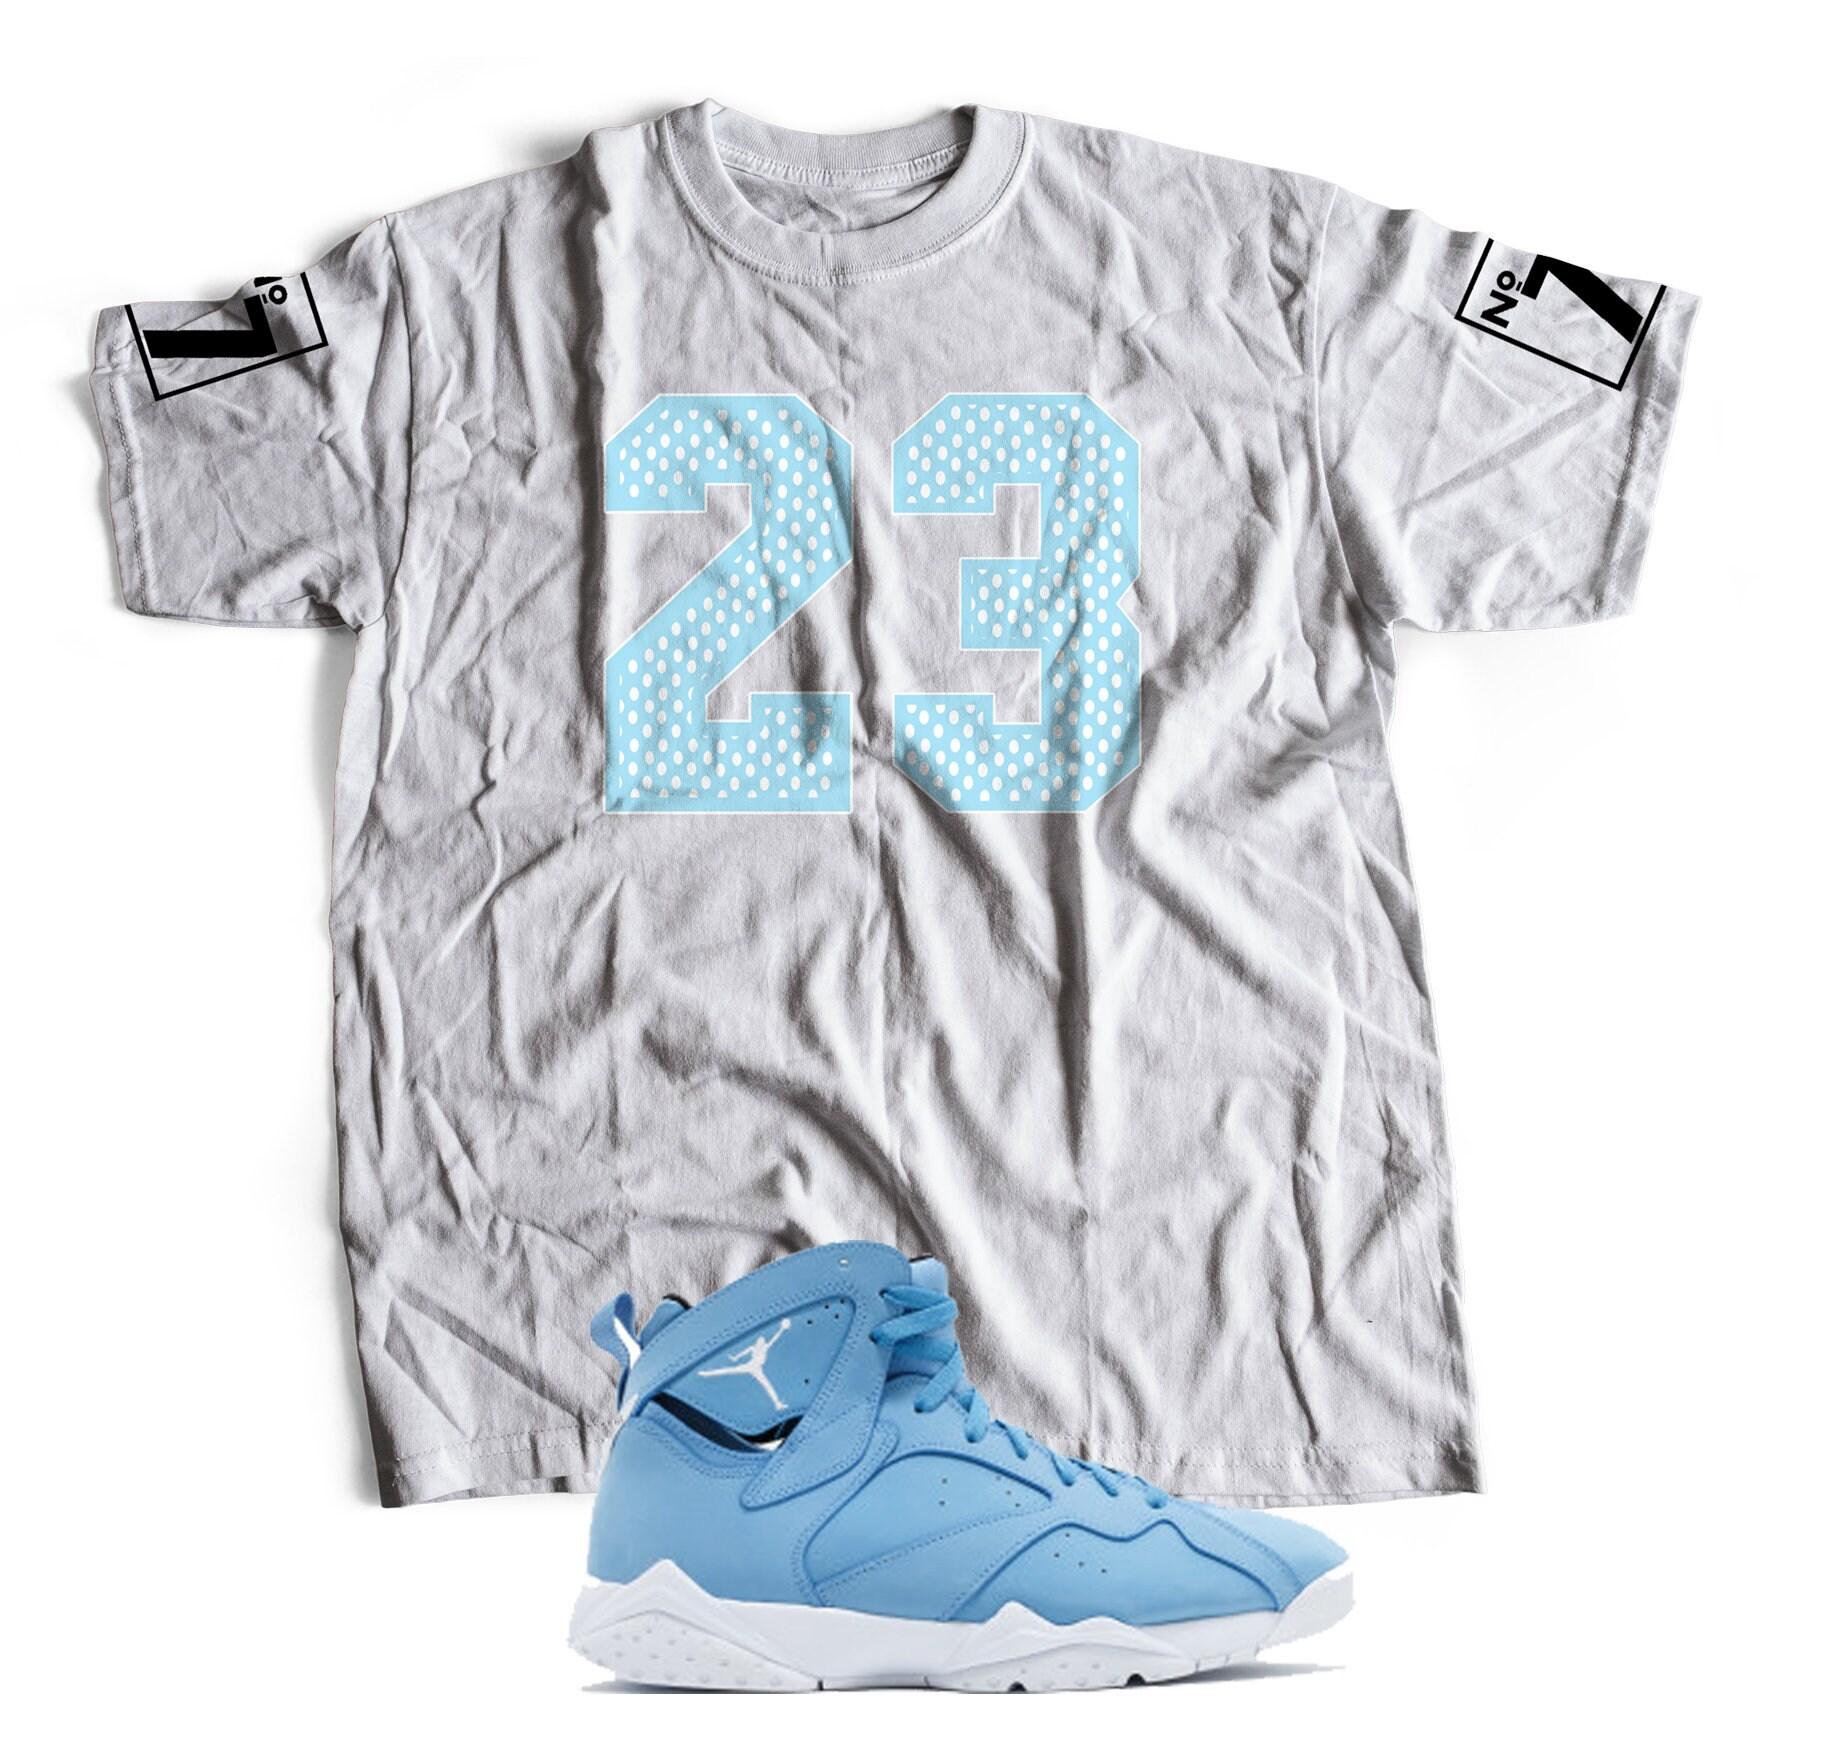 febe6a092ddf63 Jordan 7 T Shirts - DREAMWORKS